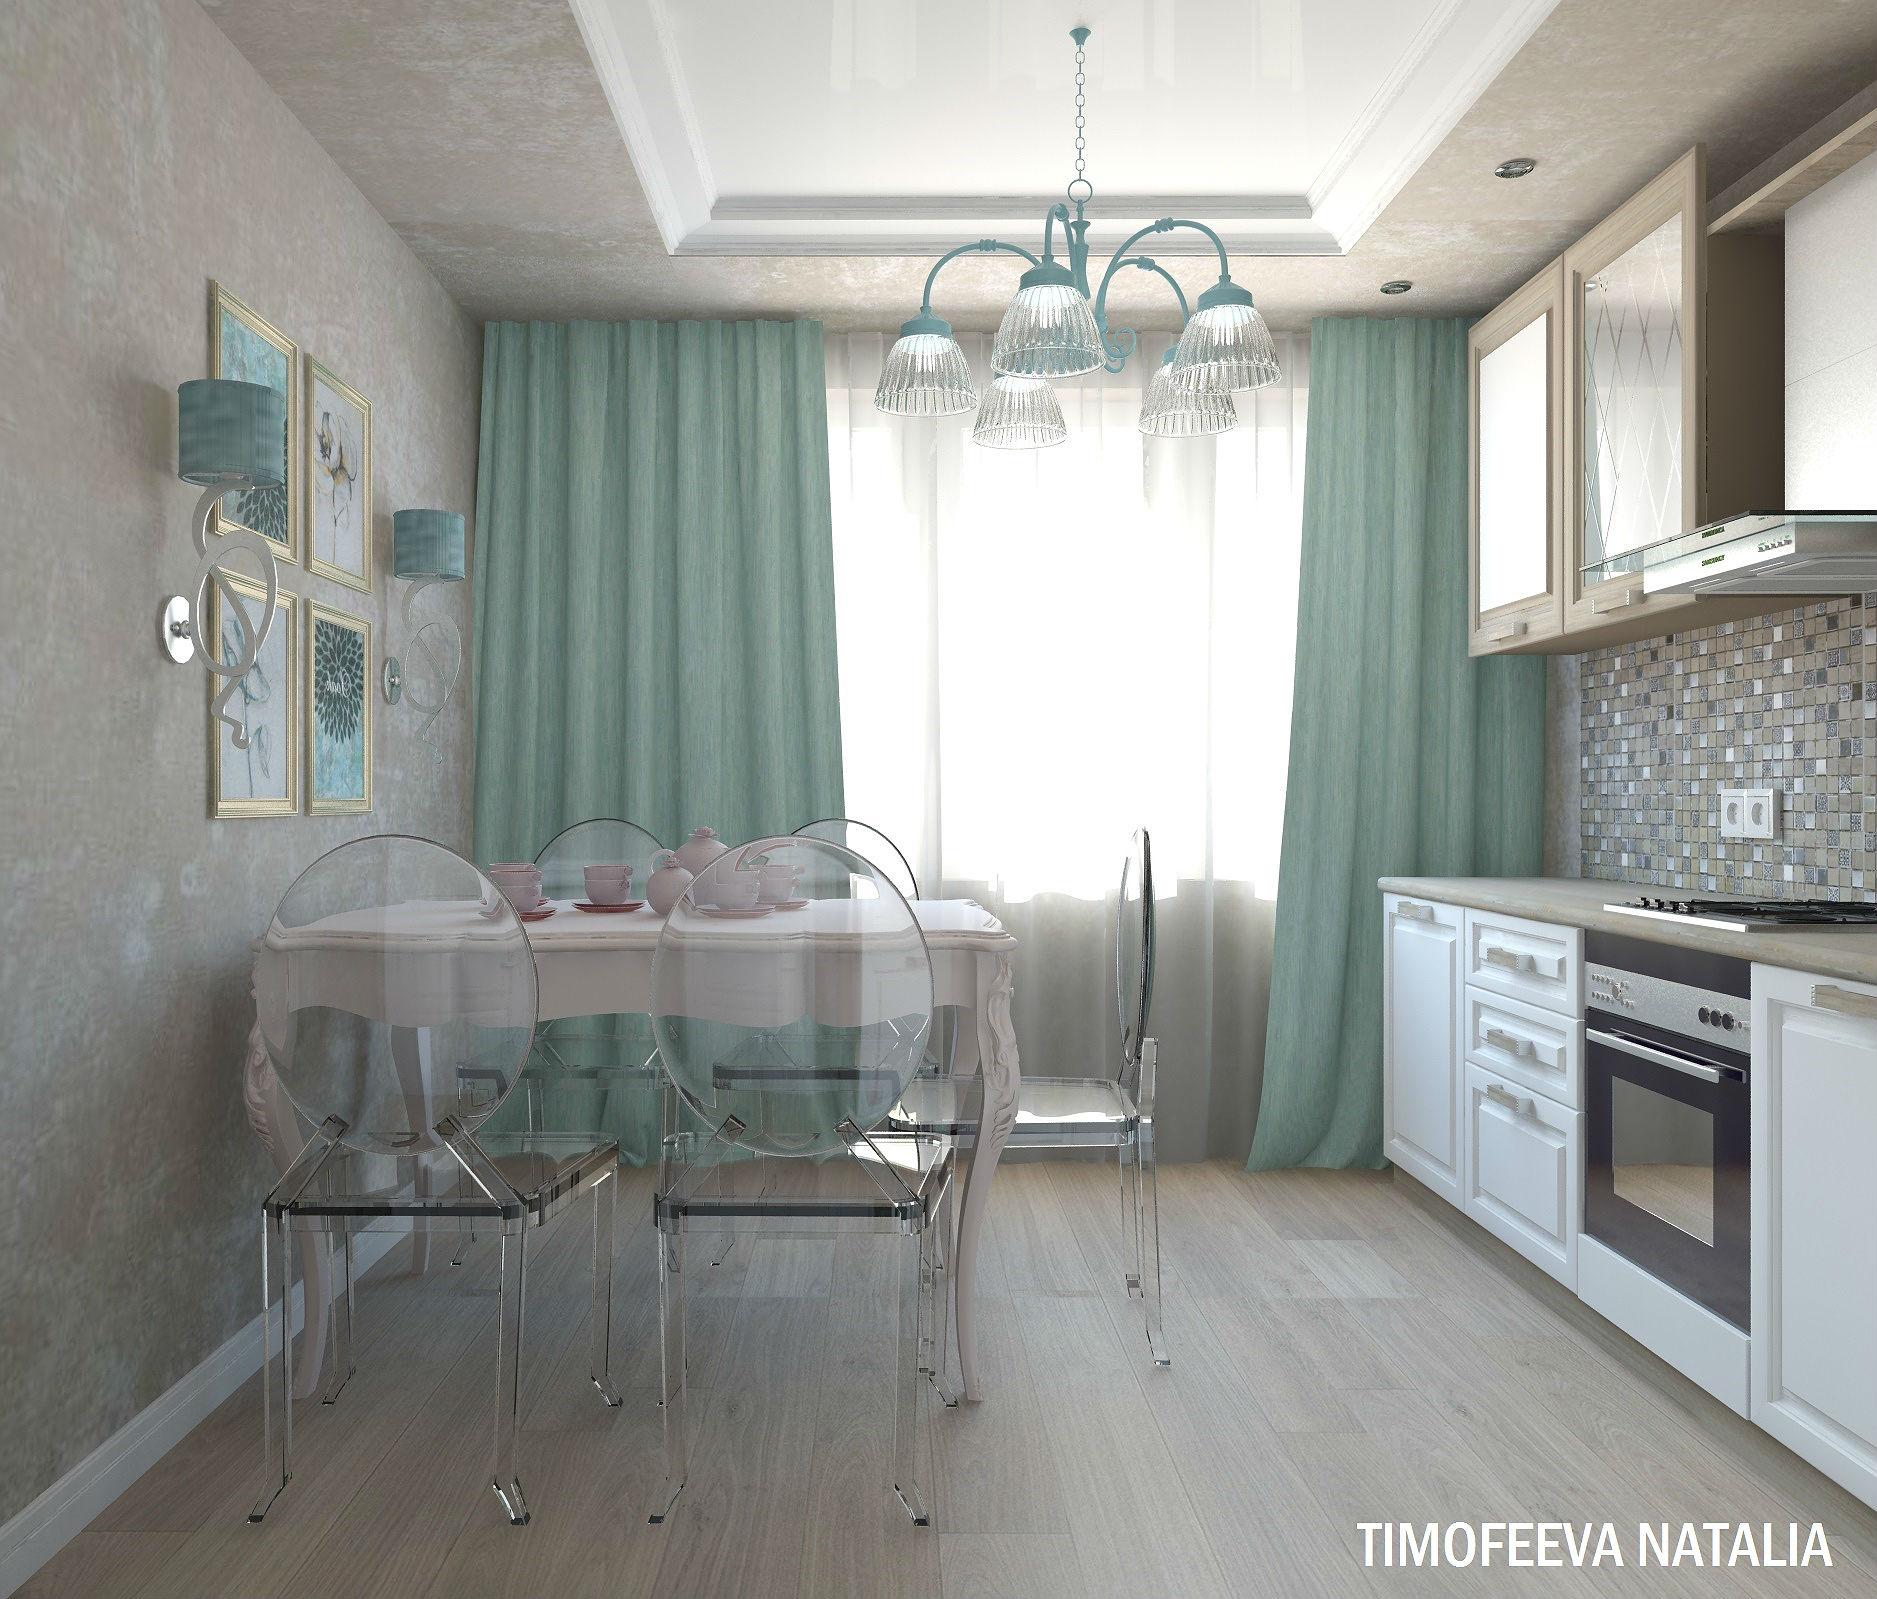 дизайн 1 комнатной квартиры фото 35 кв м фото